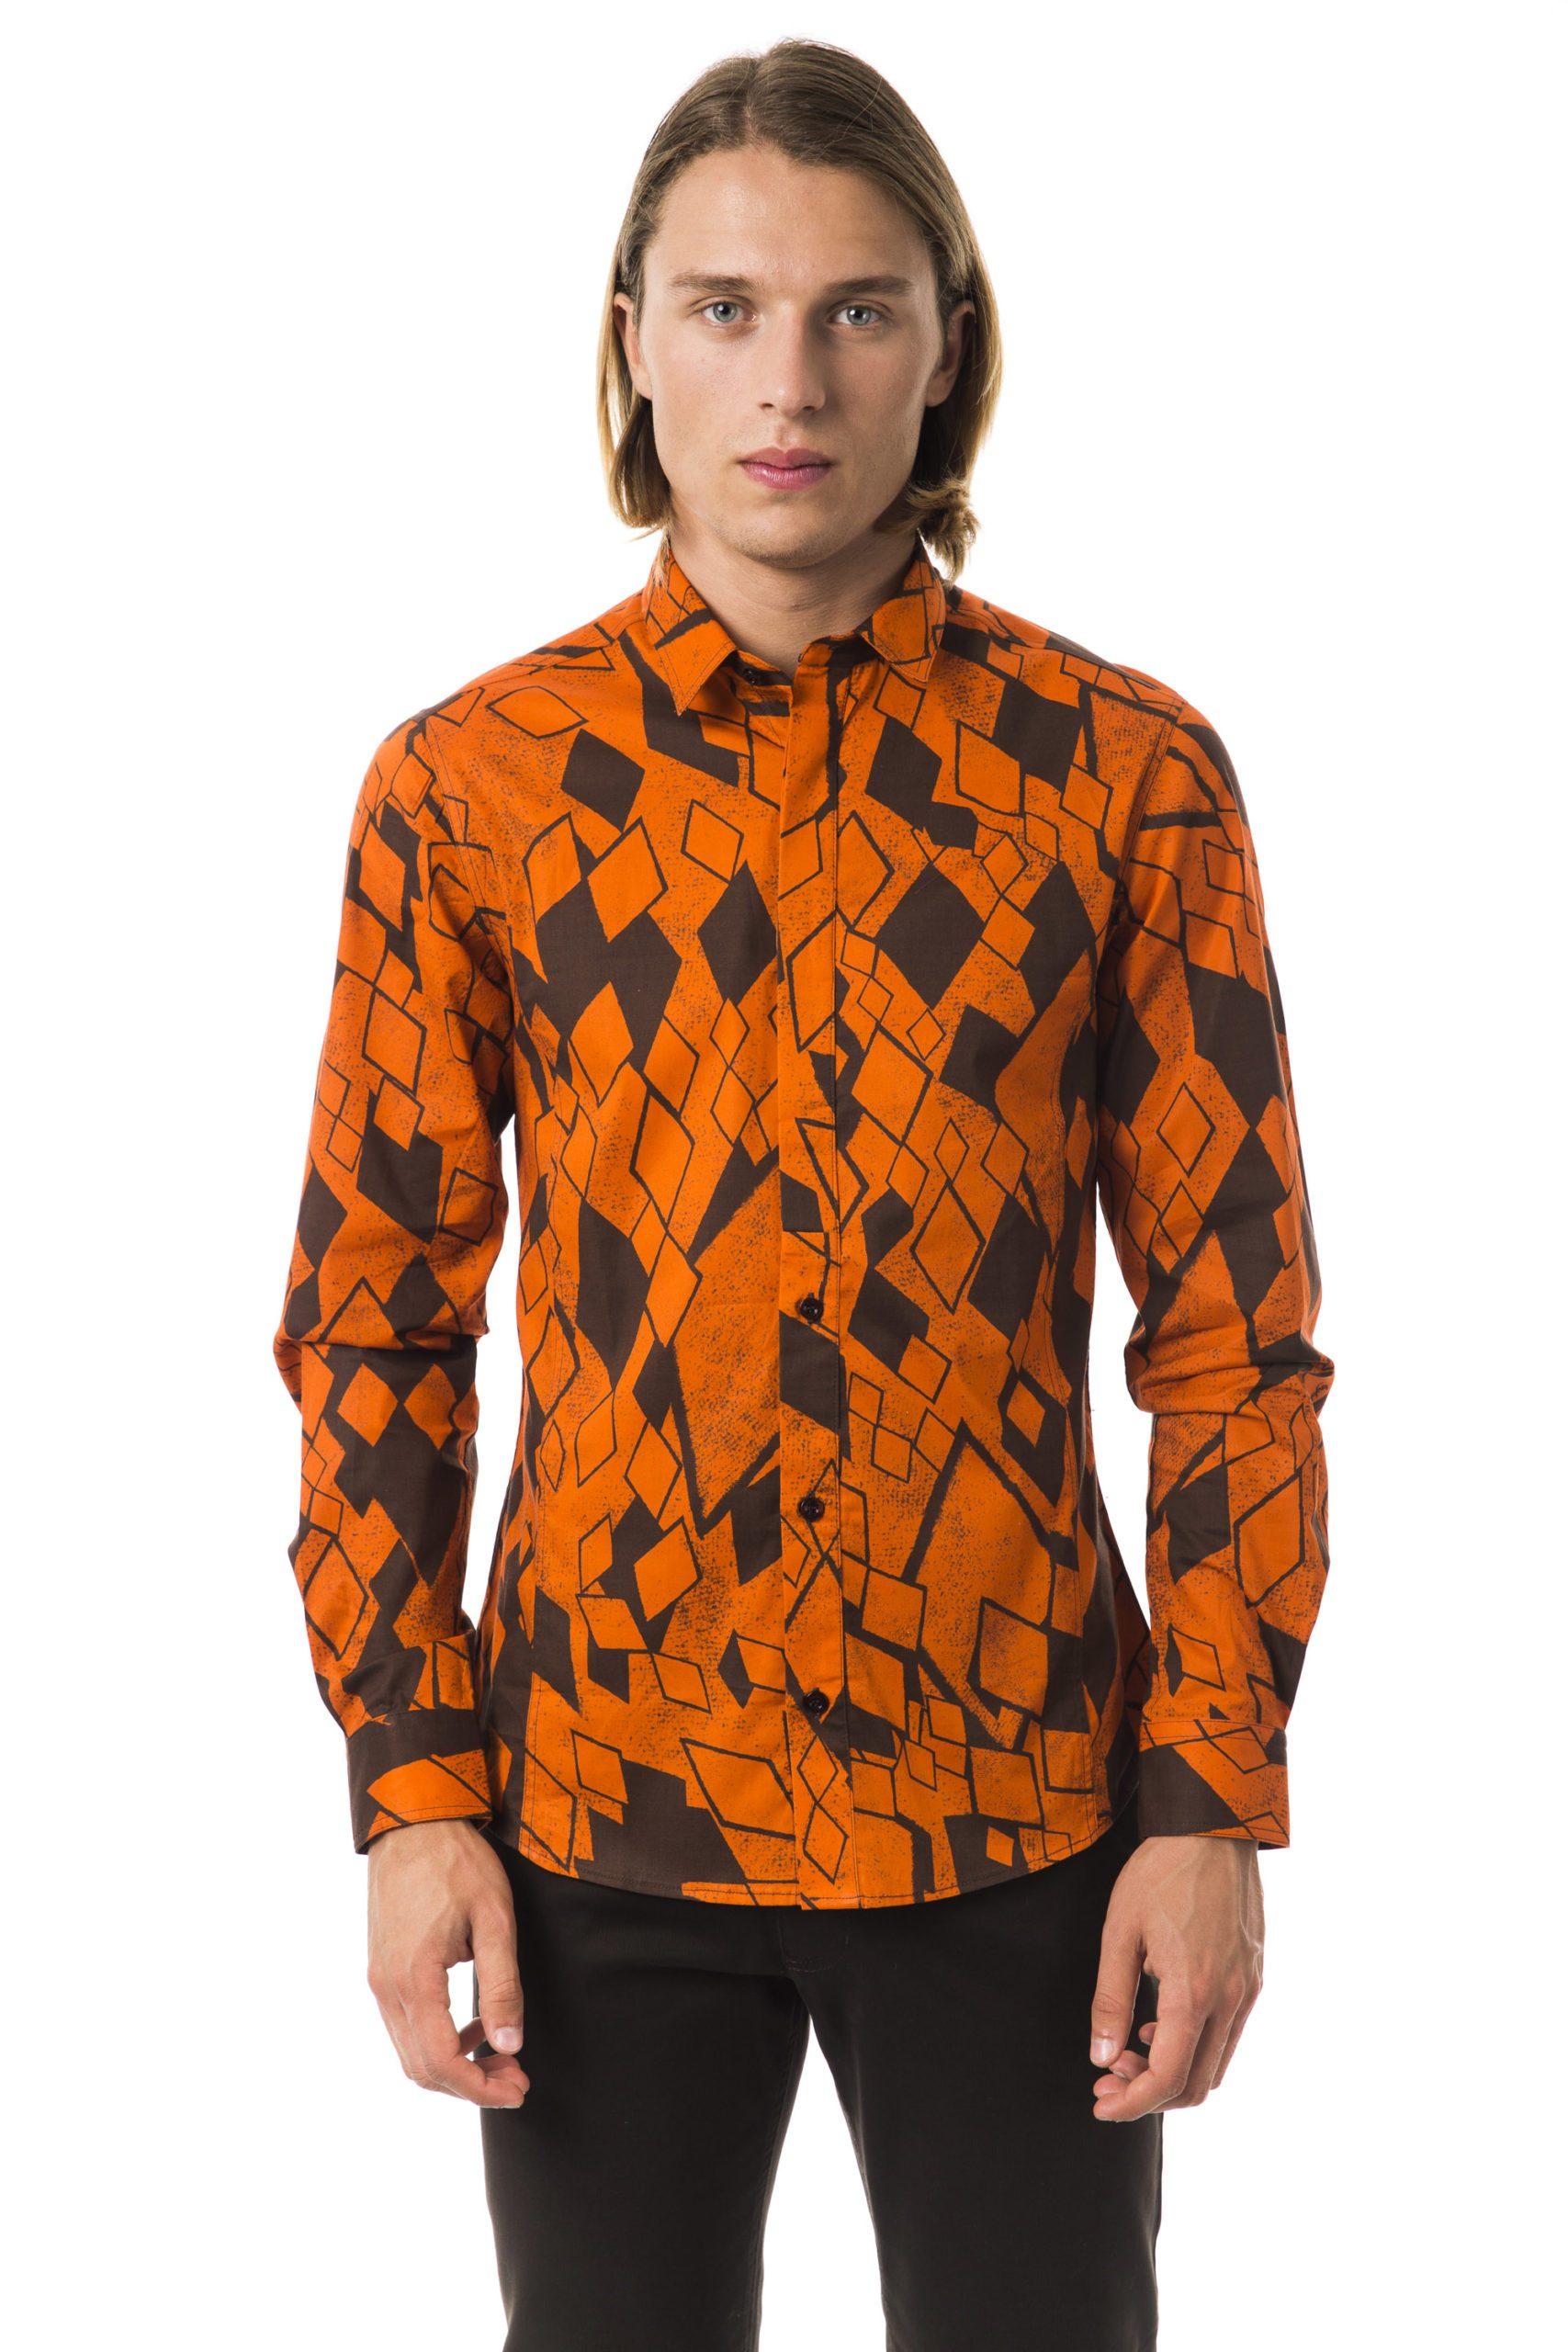 BYBLOS Men's Acacia Shirt Orange BY1394468 - S